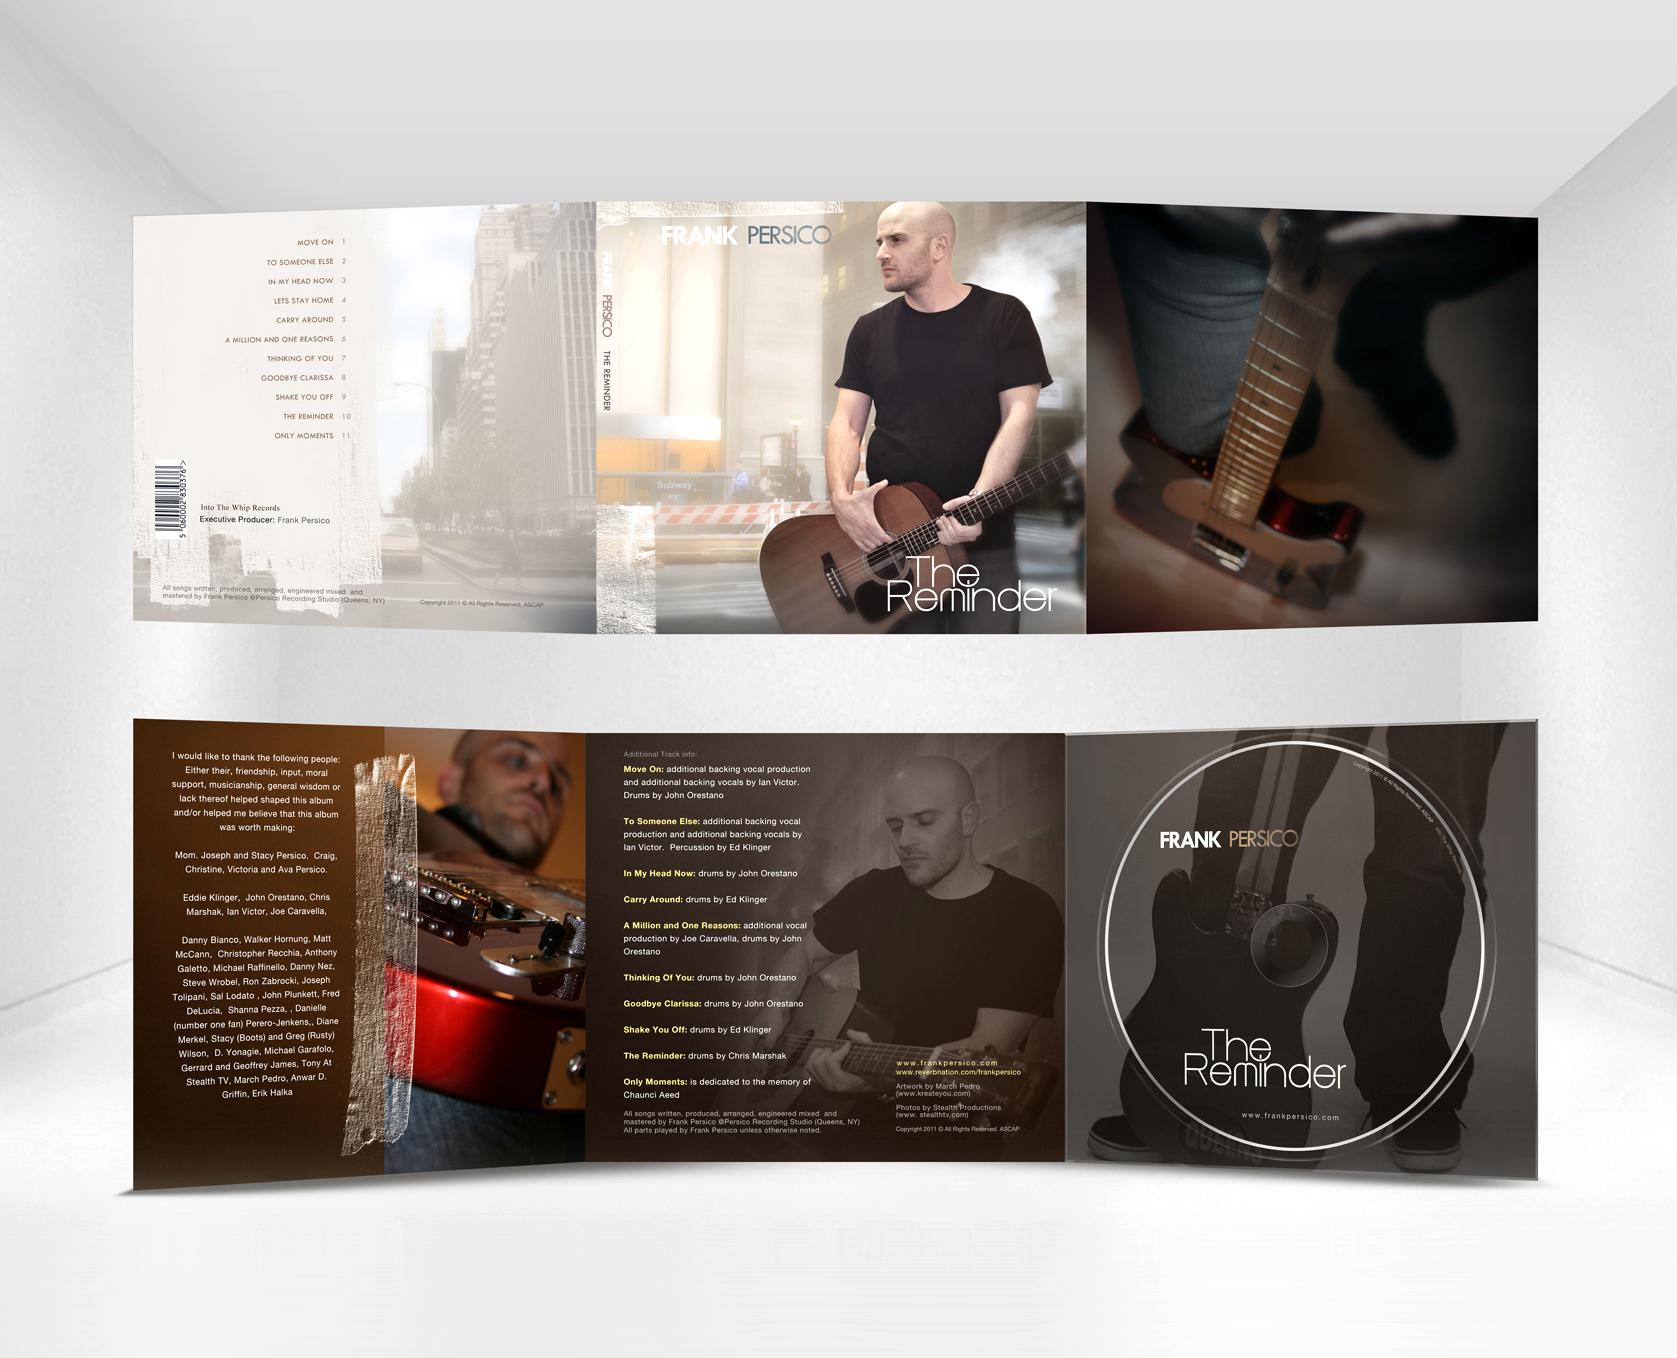 album-display.jpg